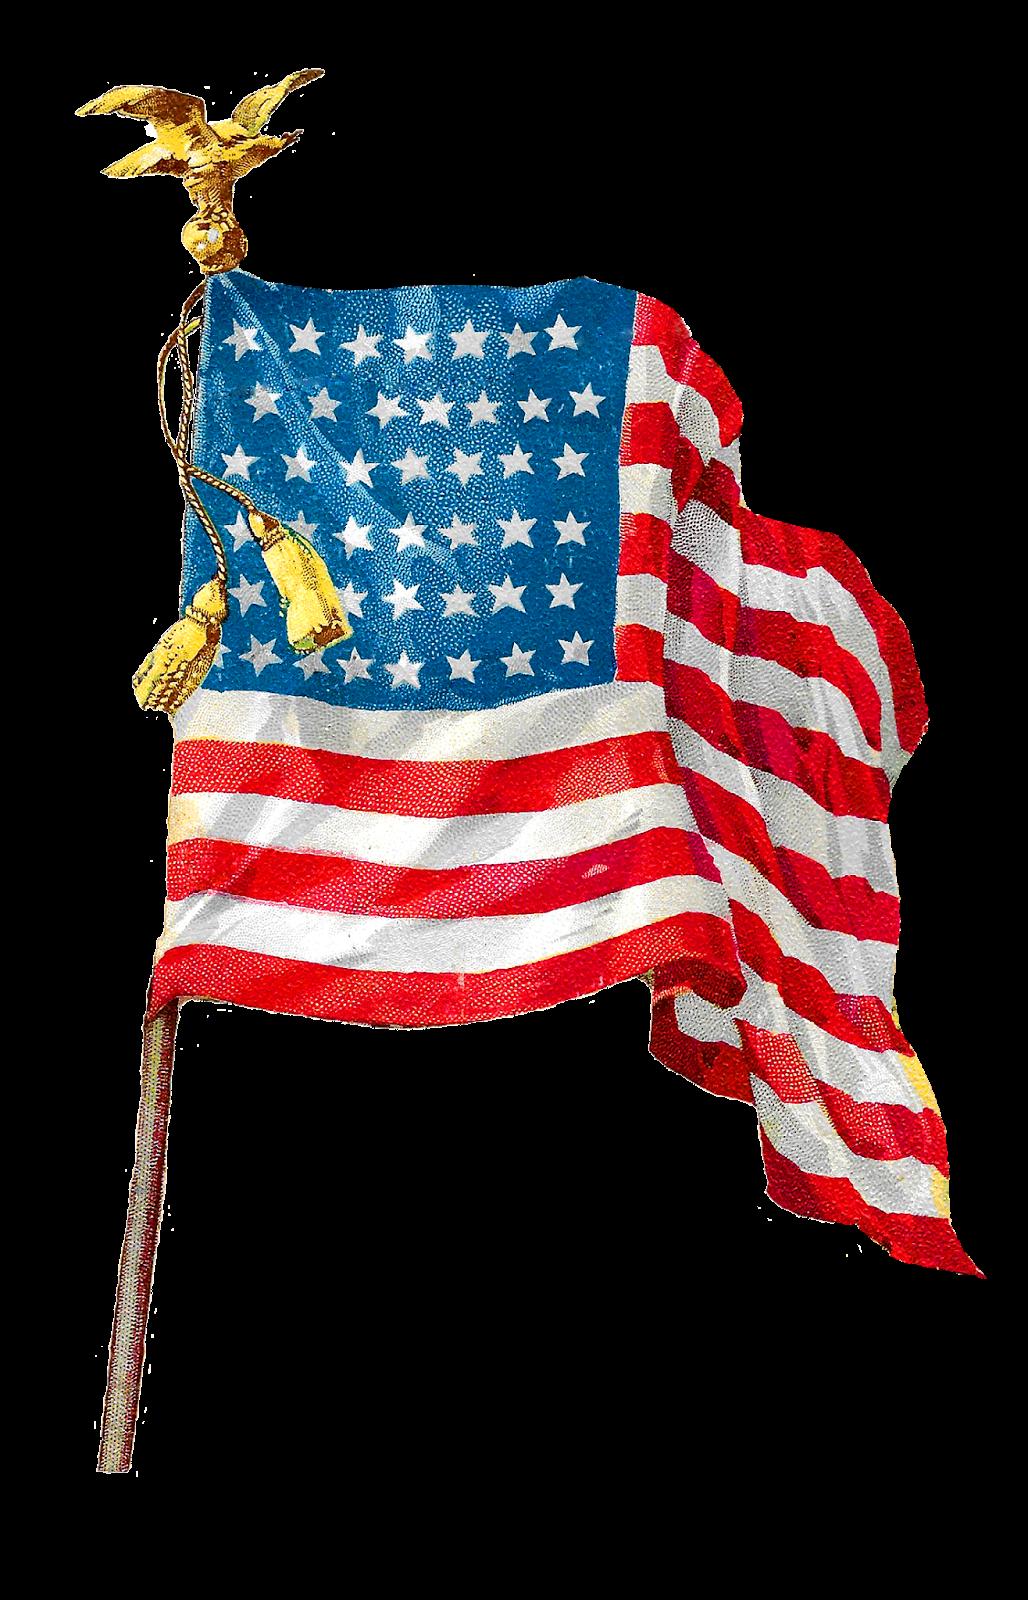 Flags clipart patriotic. Antique images vintage american